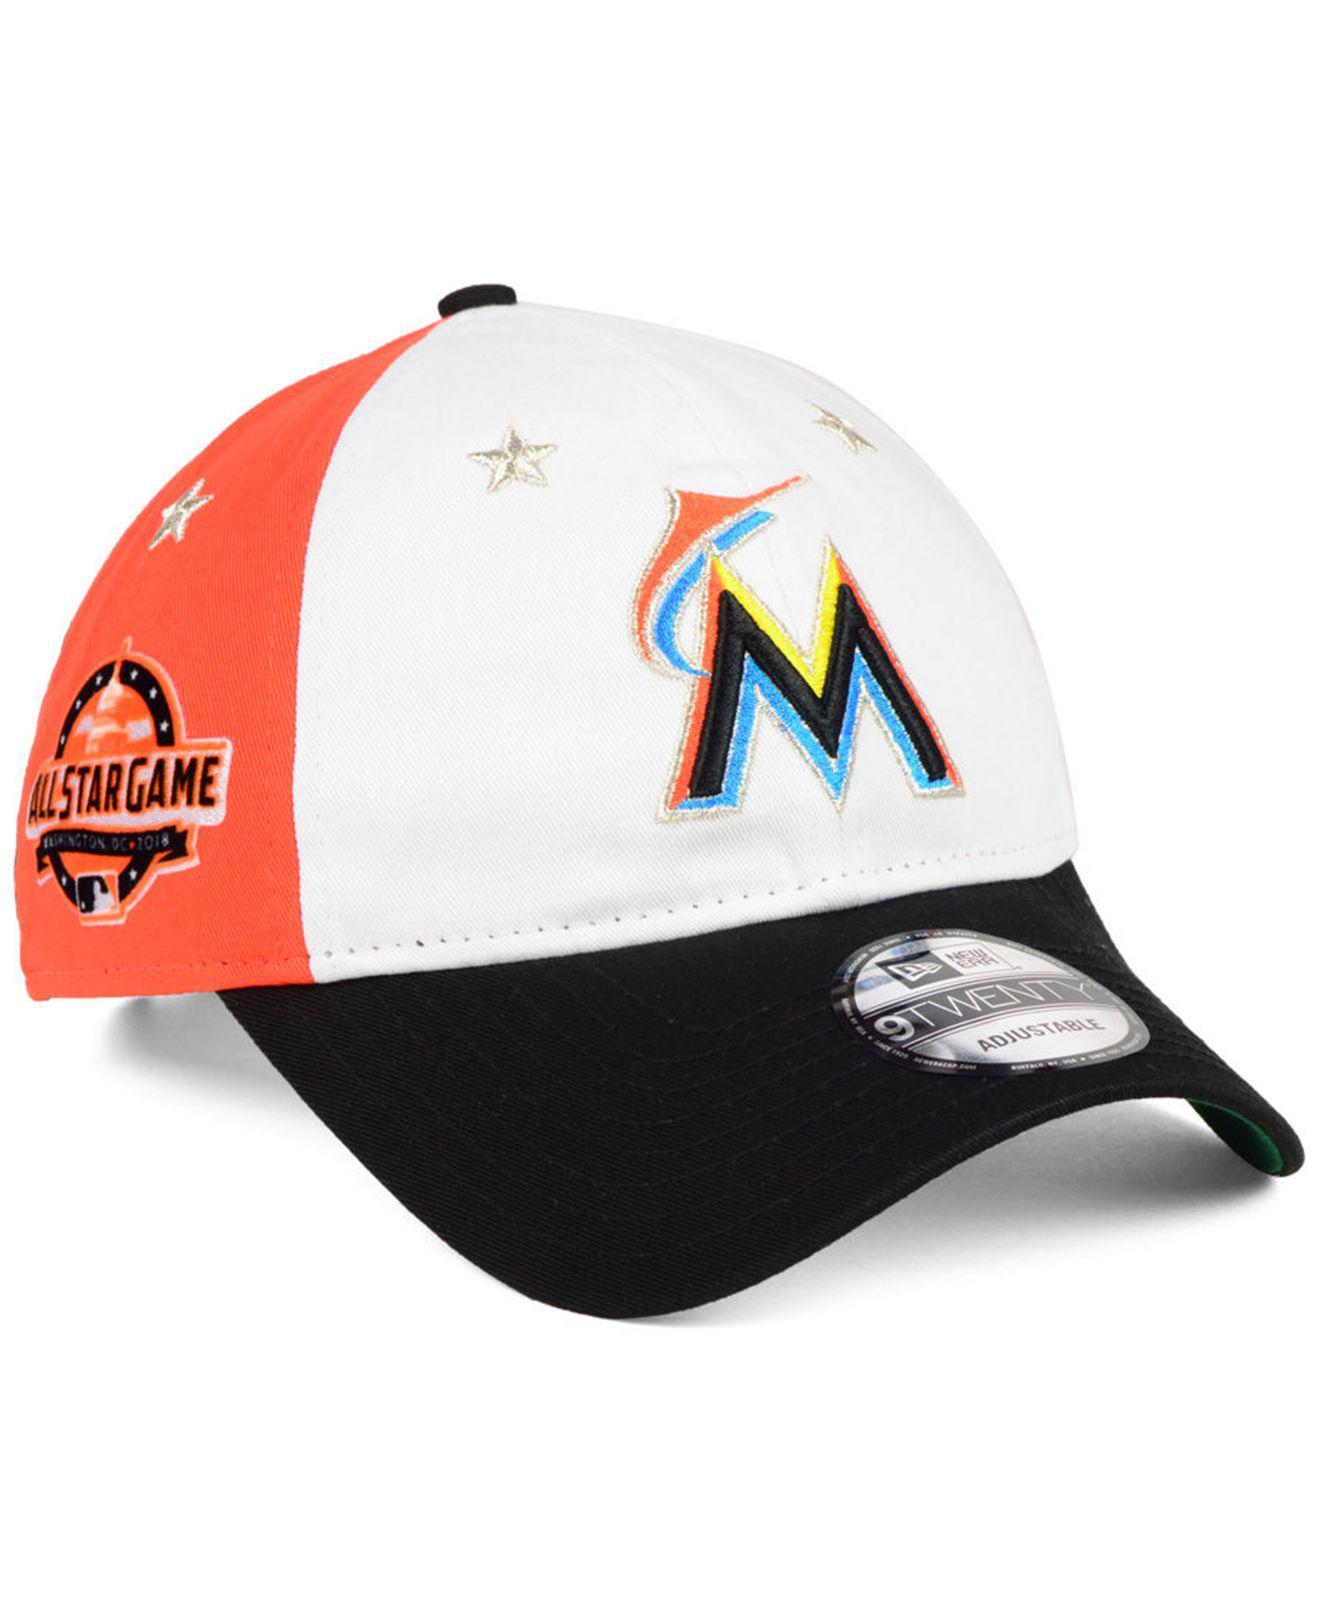 KTZ - Black Miami Marlins All Star Game 9twenty Strapback Cap 2018 for Men  - Lyst. View fullscreen 69b4a4d8c52